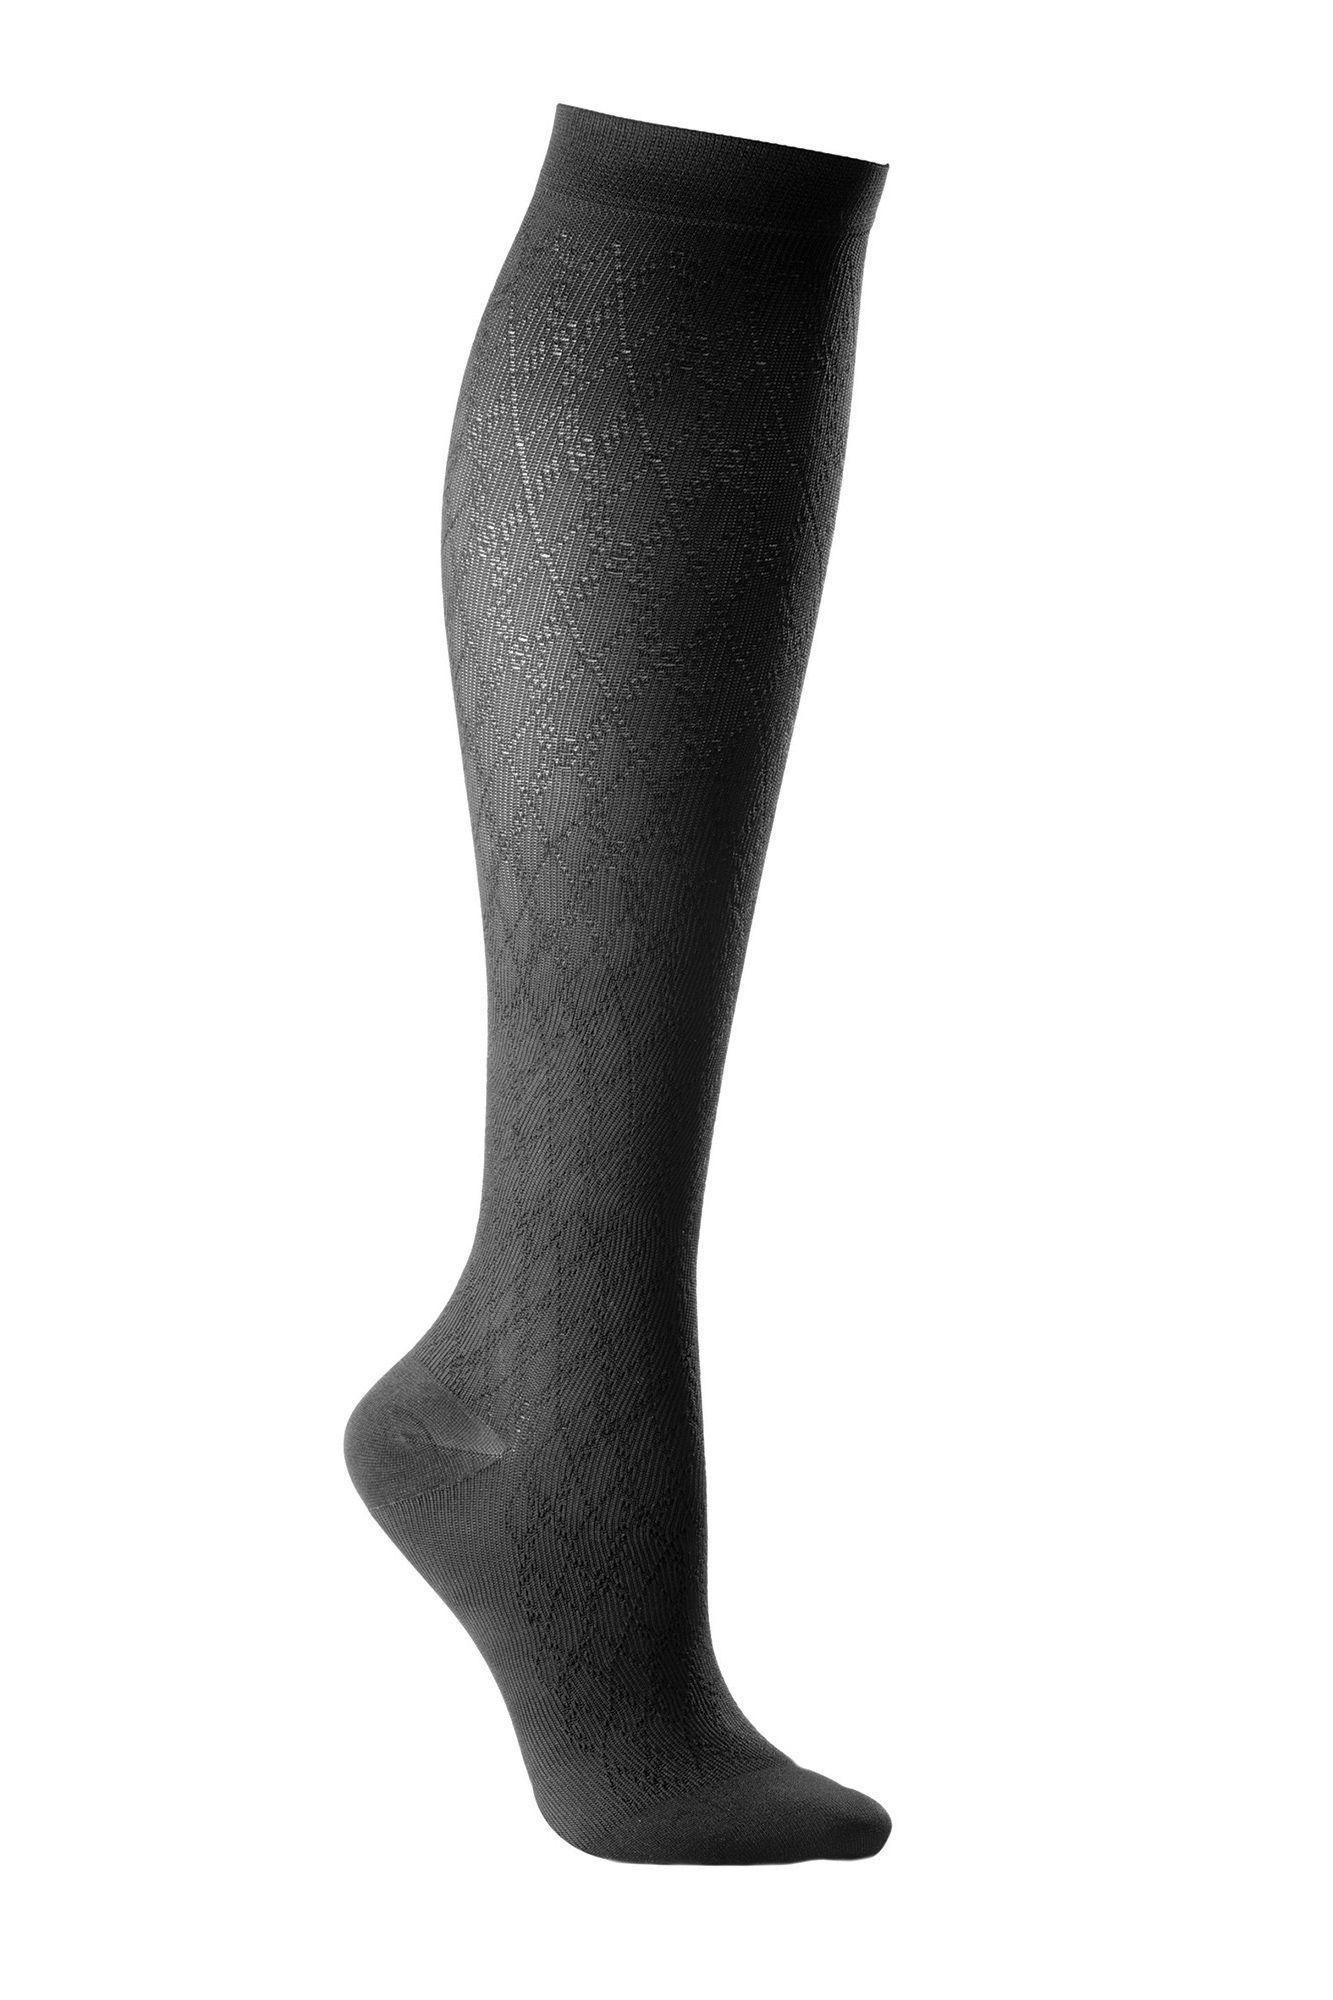 2ced8c6d6e Activa Class 2 Unisex Patterned Socks - Daylong